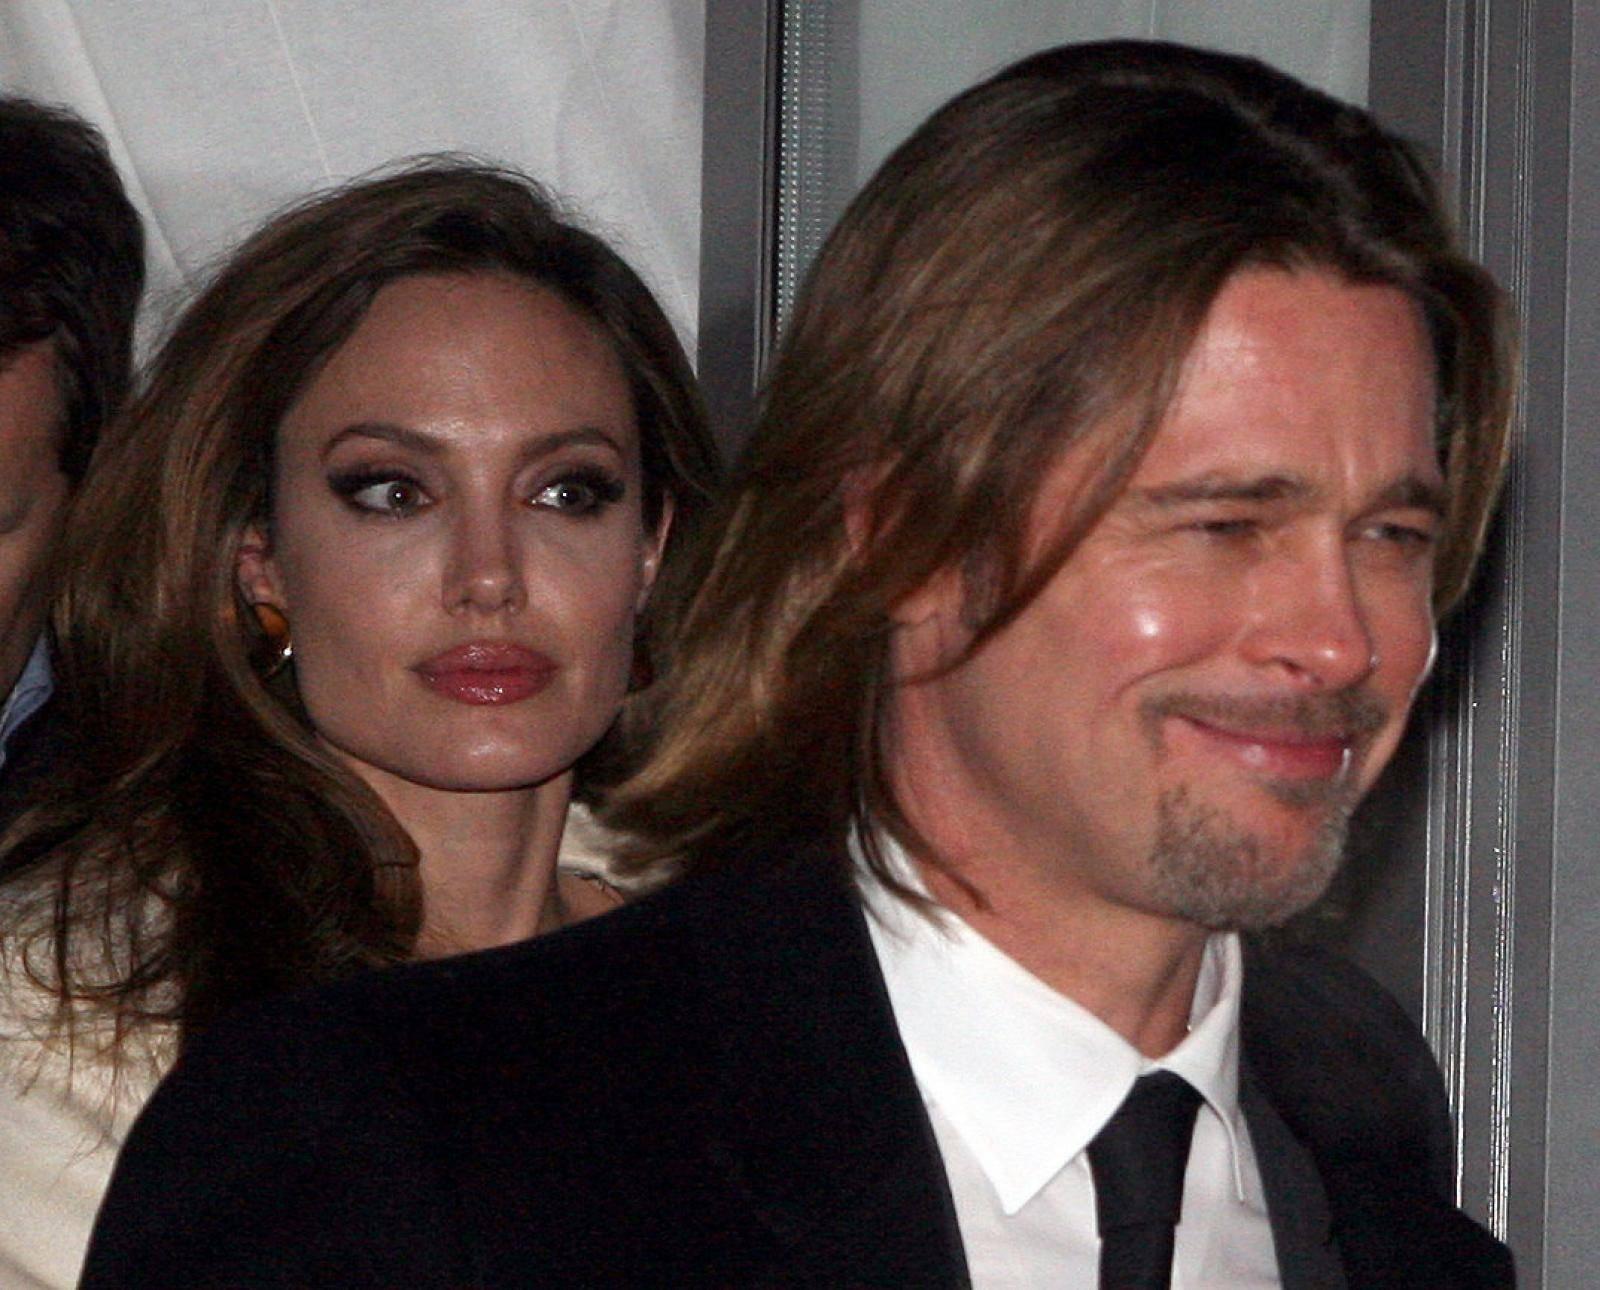 Berlinale 2012 -  Pitt and Jolie